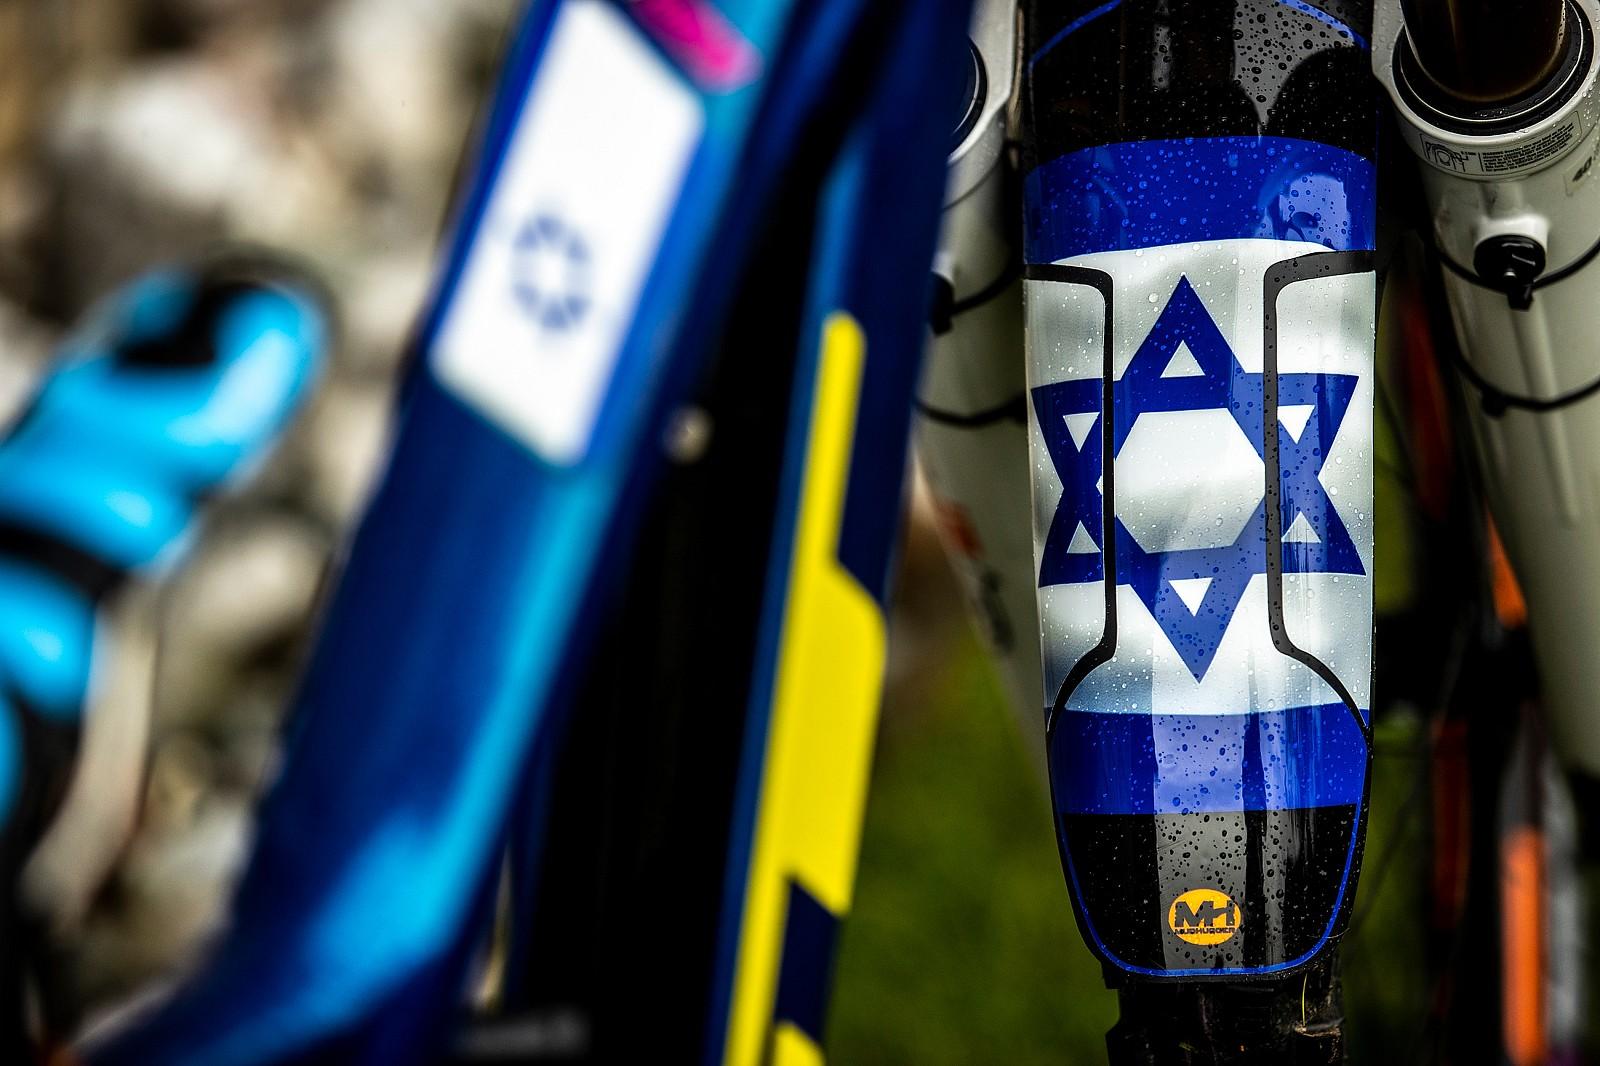 Noga Korem Repping Israel - WORLD CHAMPS BIKES - GT Factory Racing - Mountain Biking Pictures - Vital MTB